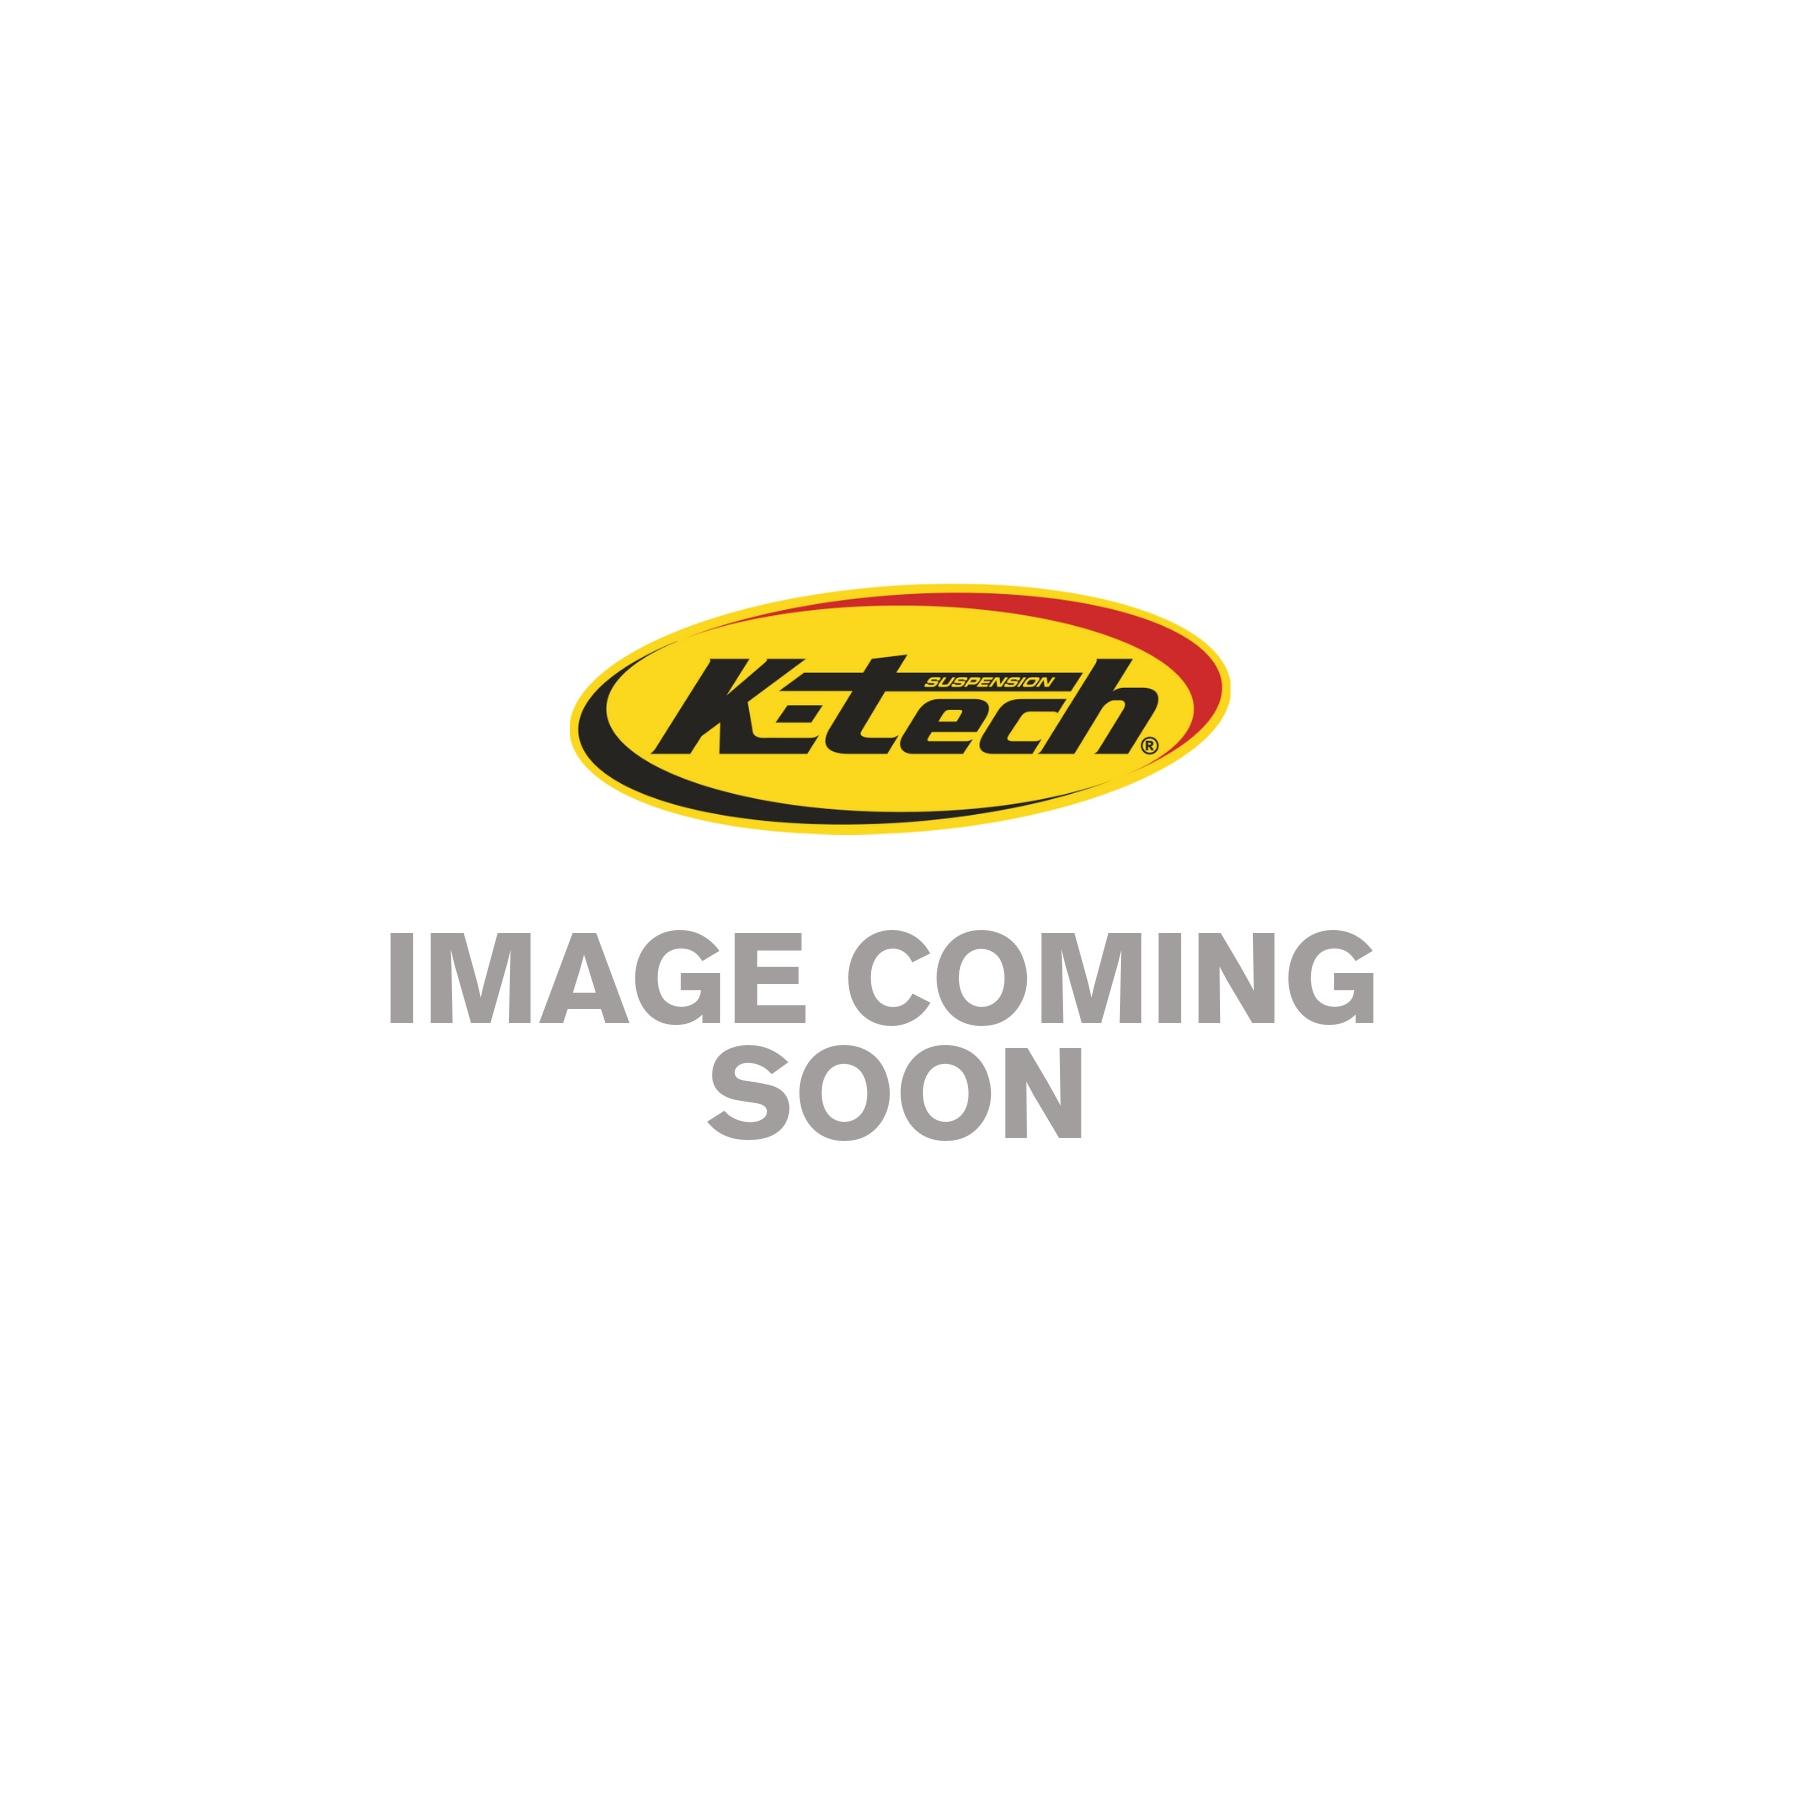 K-Tech Vacuum Filling Machine (240v)